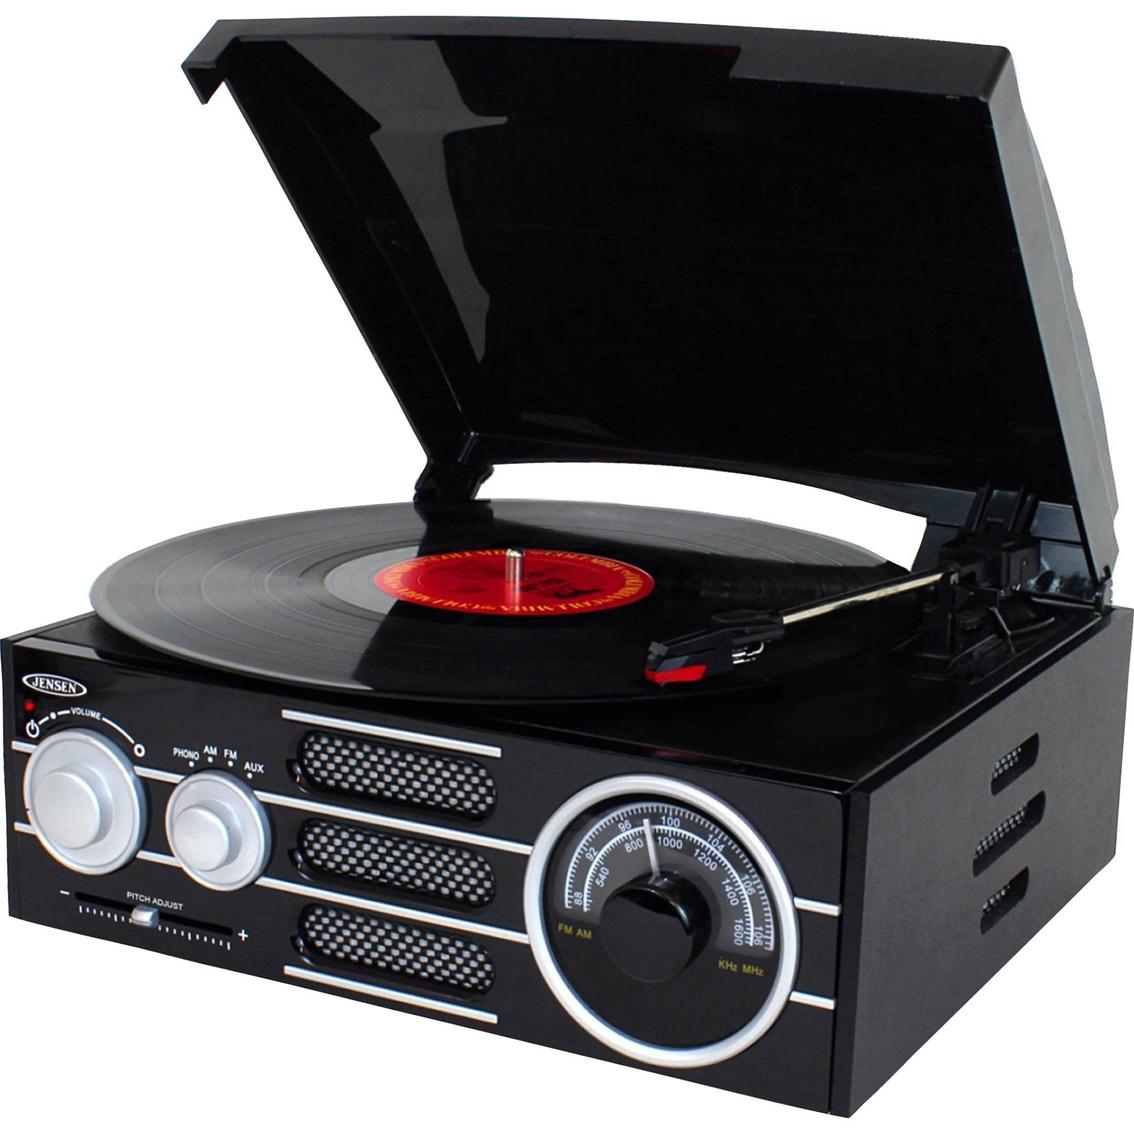 Jensen Retro 3 Speed Stereo Turntable With Radio